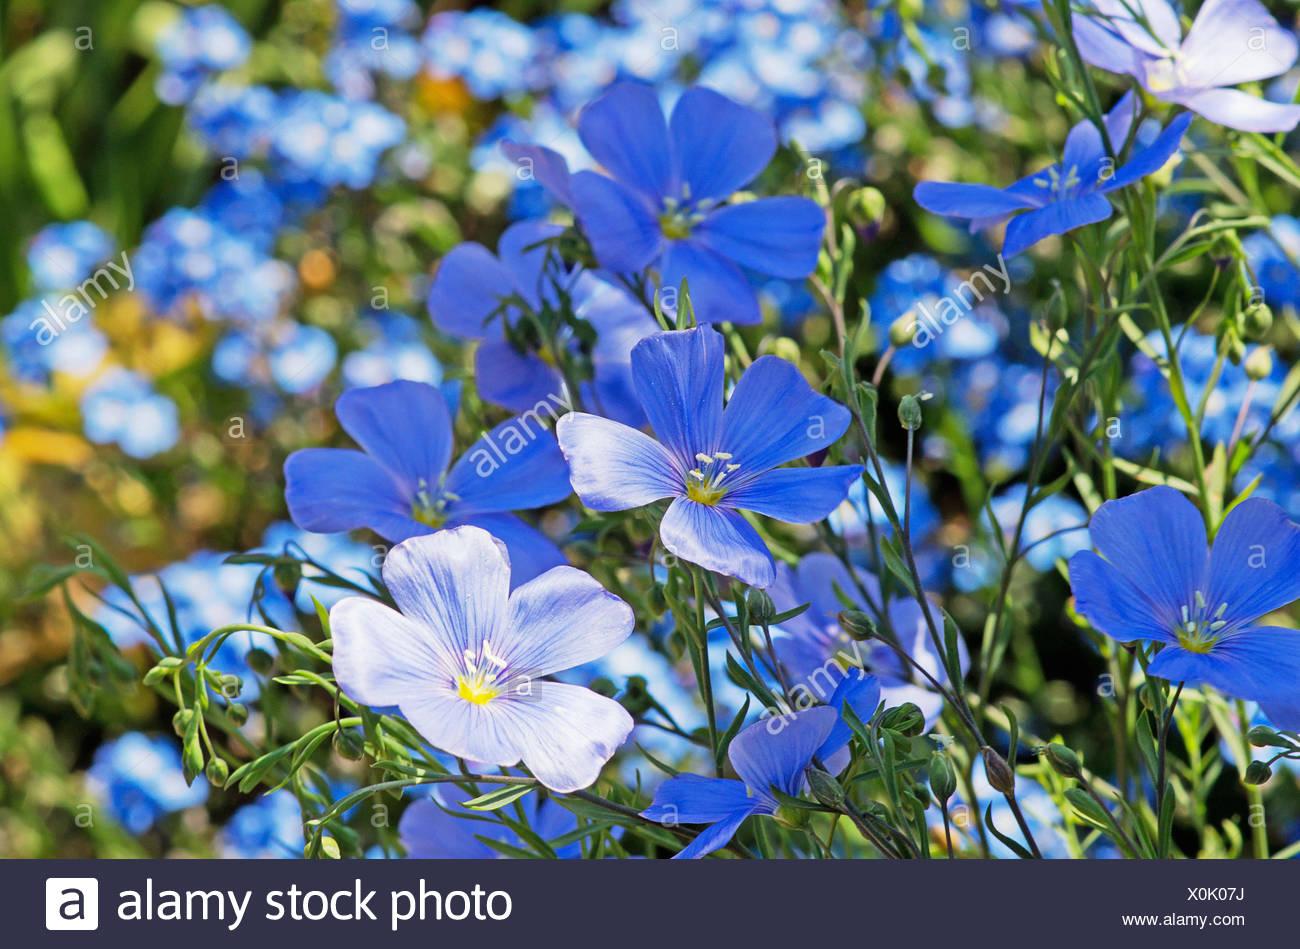 Small blue flowers of perennial flax linum perenne stock photo small blue flowers of perennial flax linum perenne izmirmasajfo